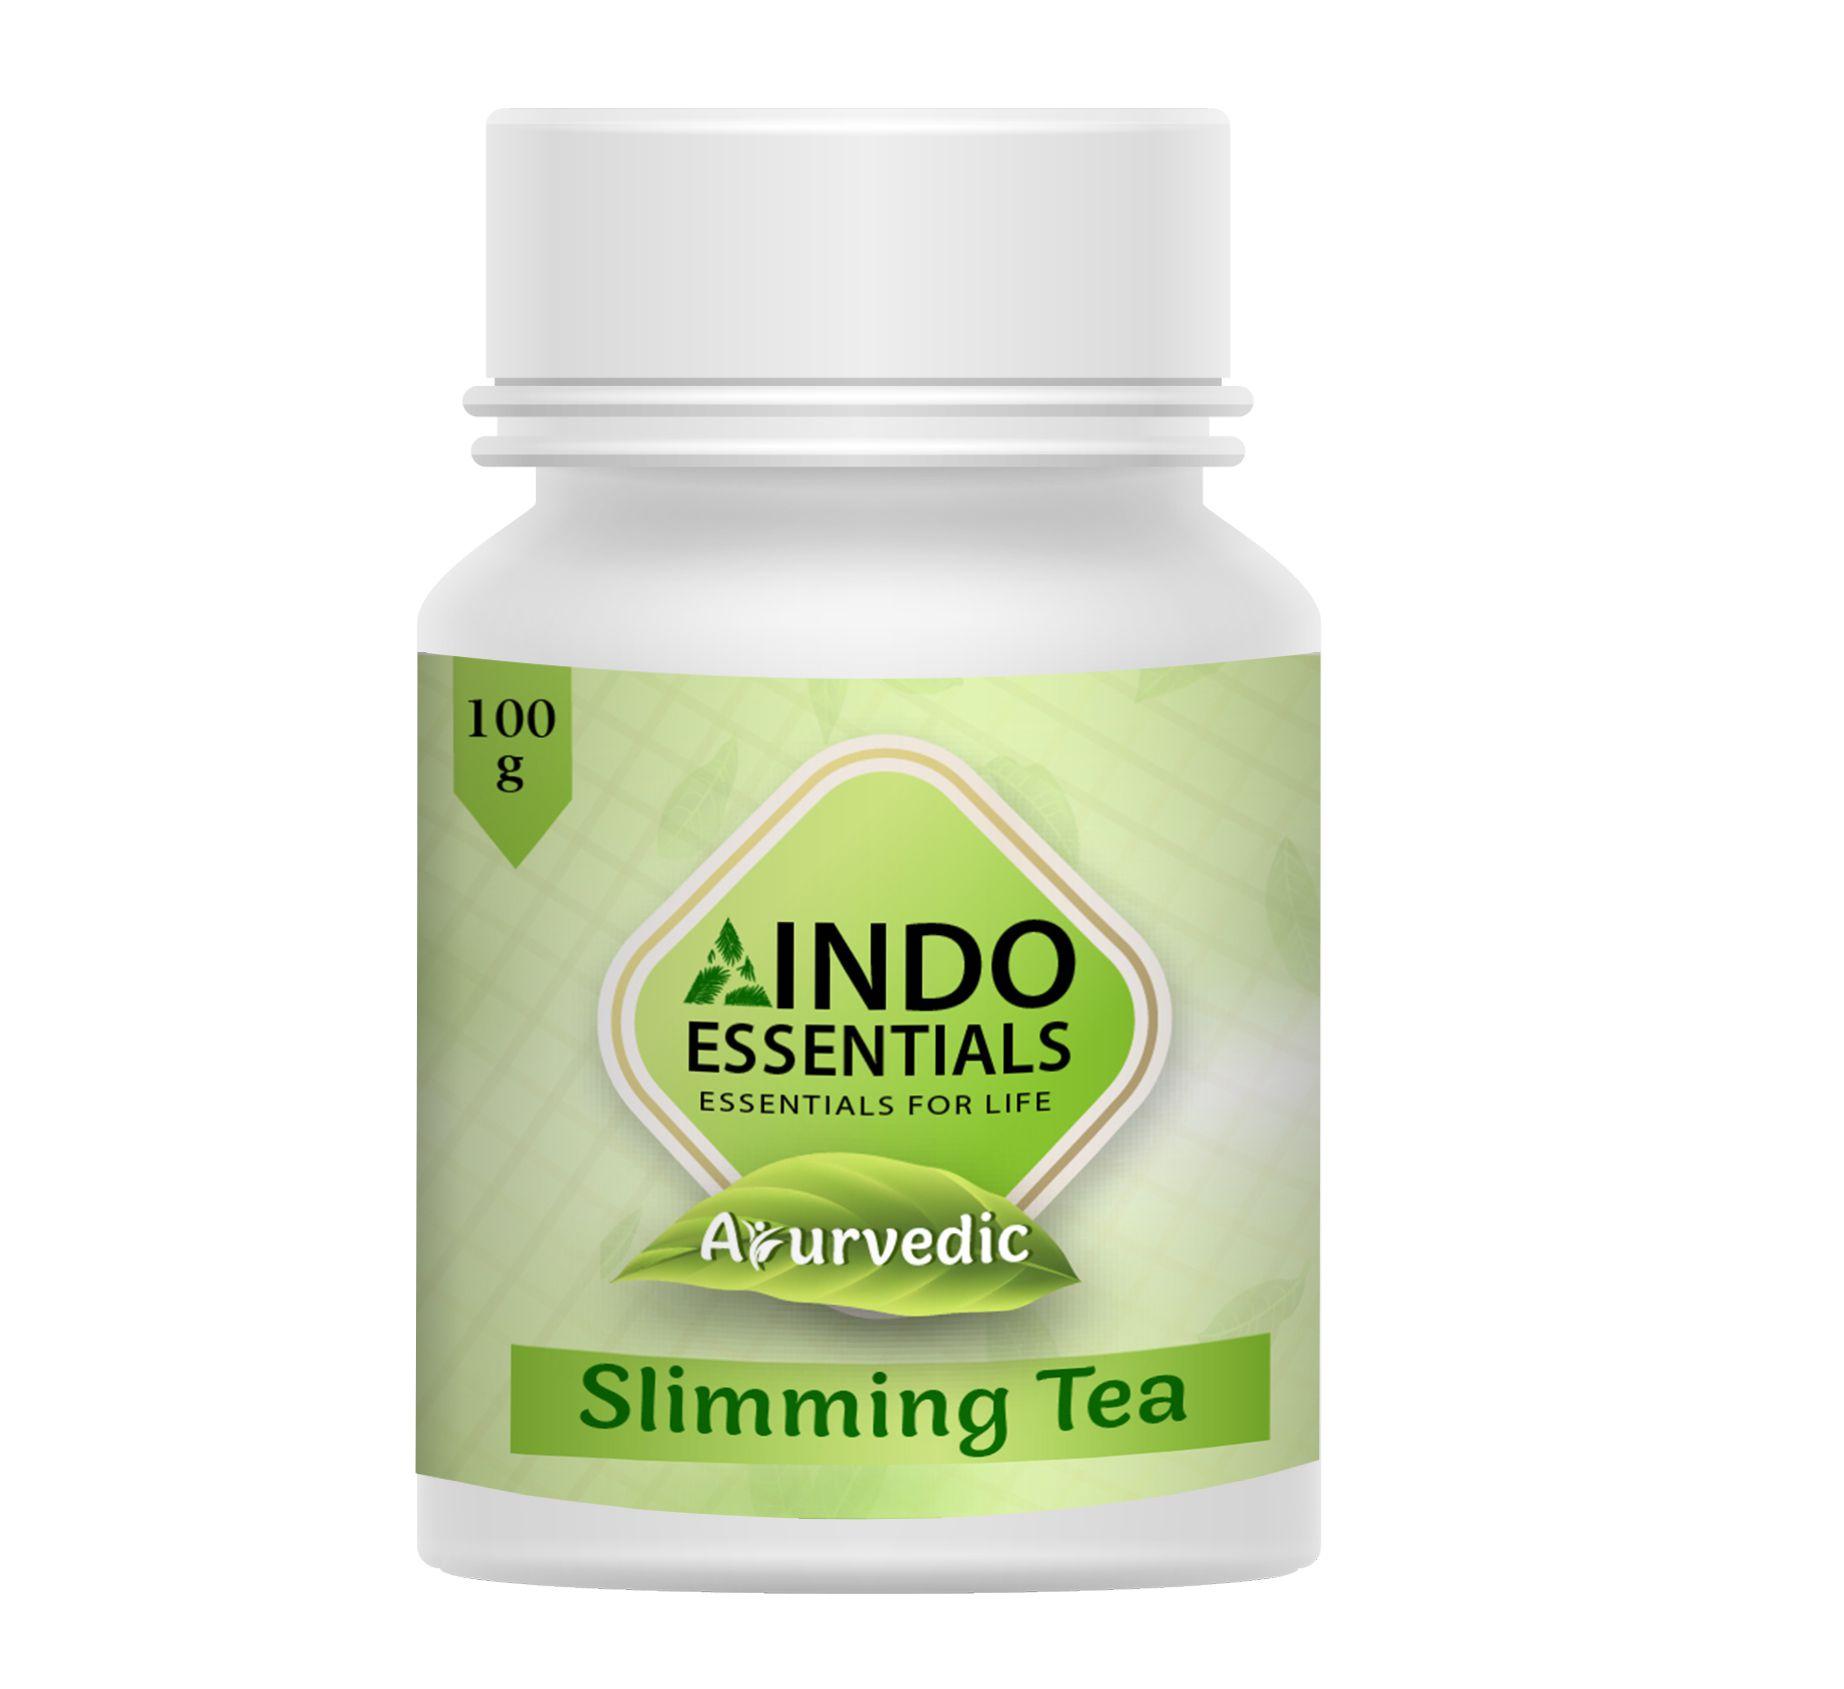 Indo Essentials Slim Tea Loose Leaf 100 gm